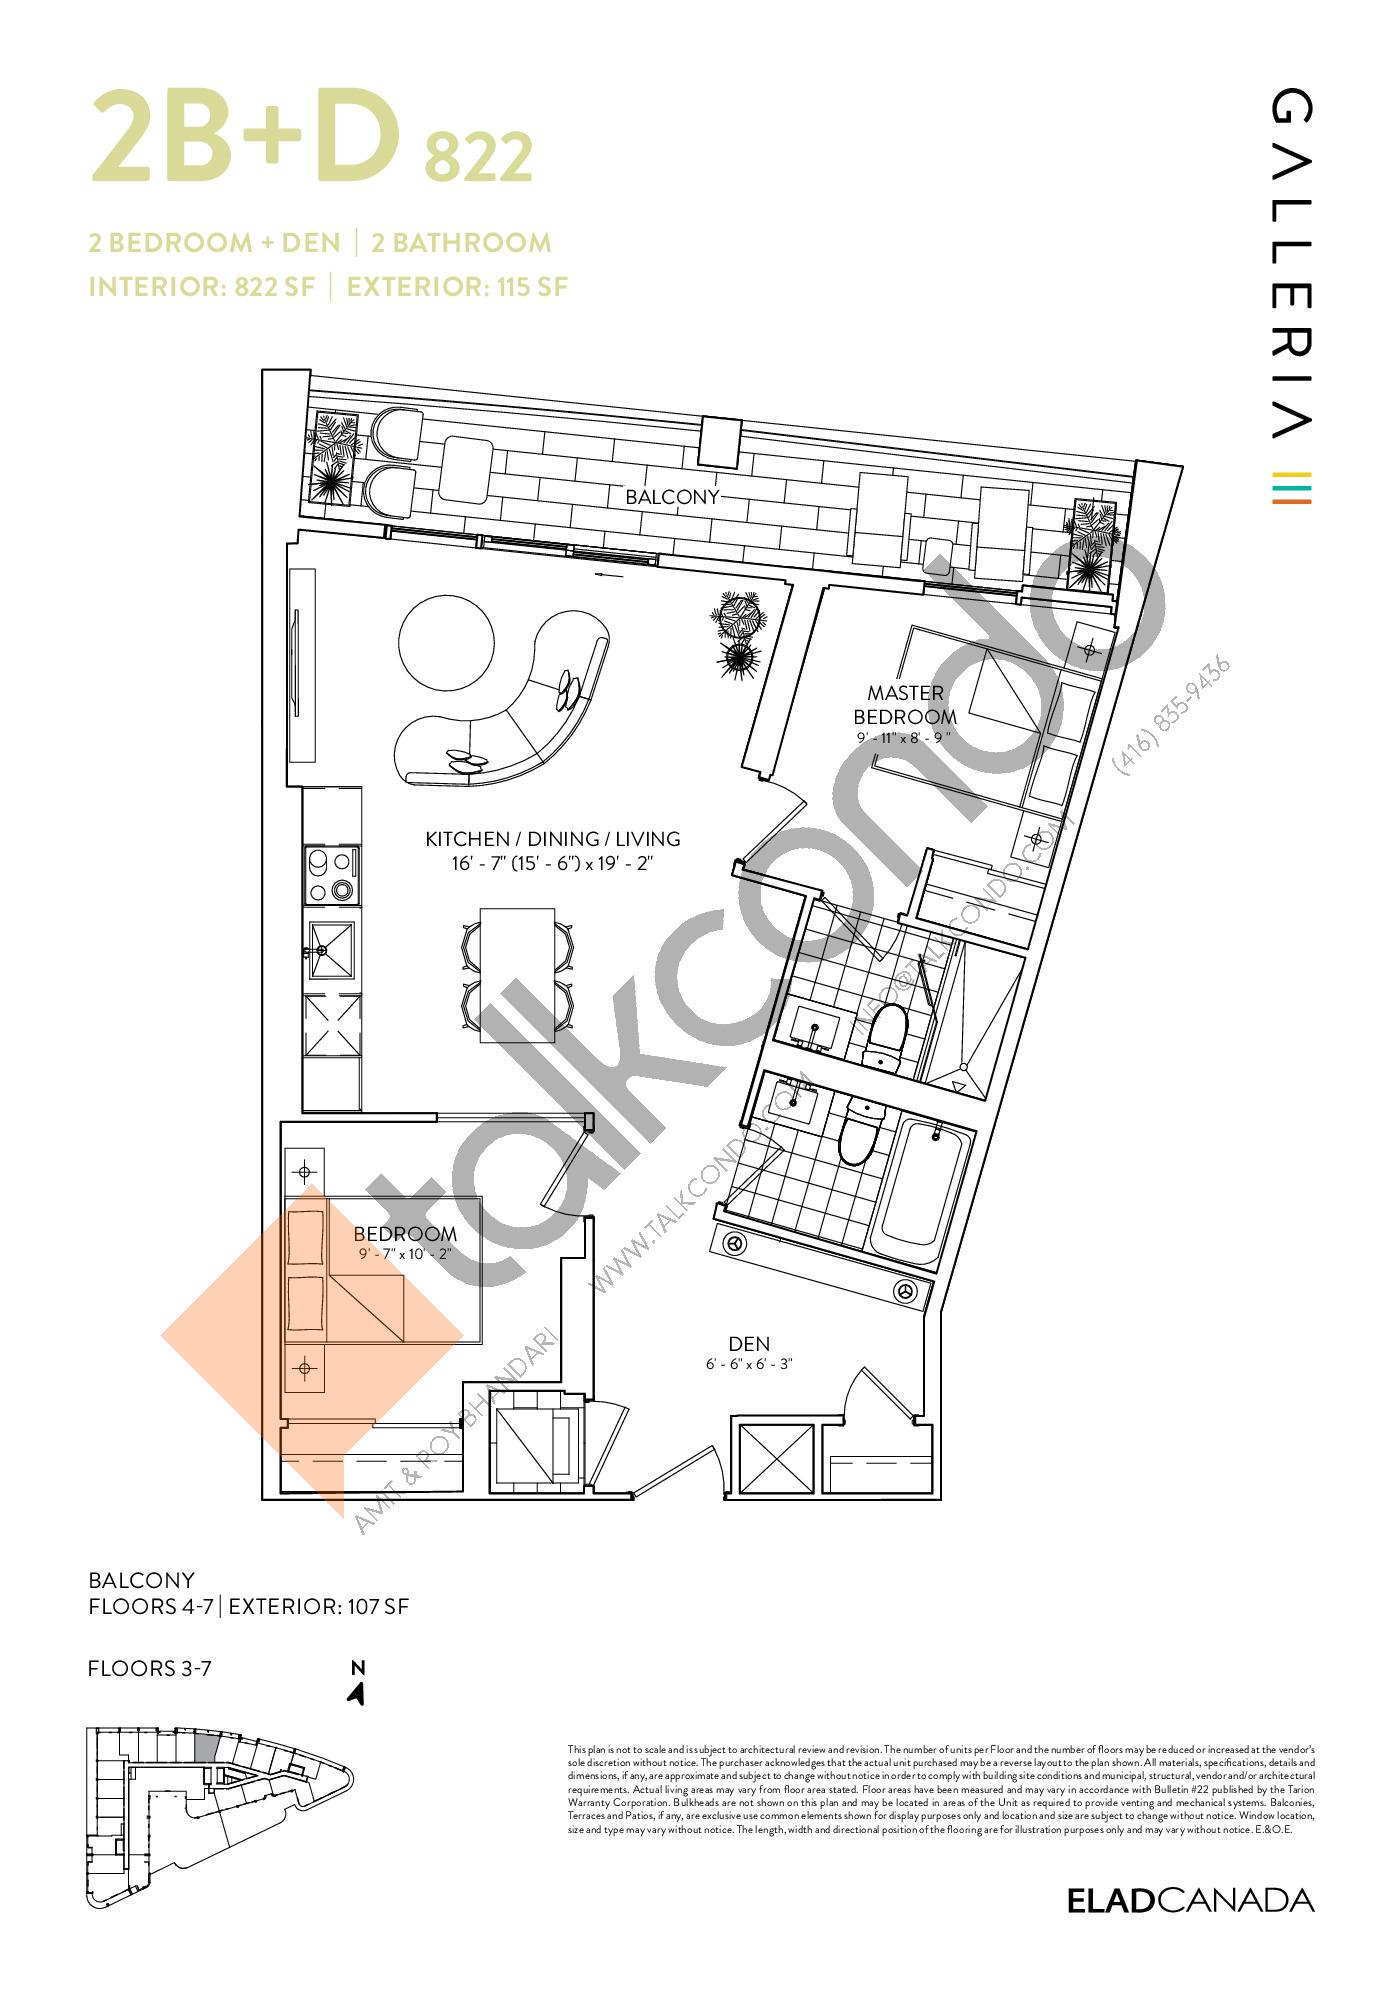 2B+D 822 Floor Plan at Galleria 03 Condos - 822 sq.ft